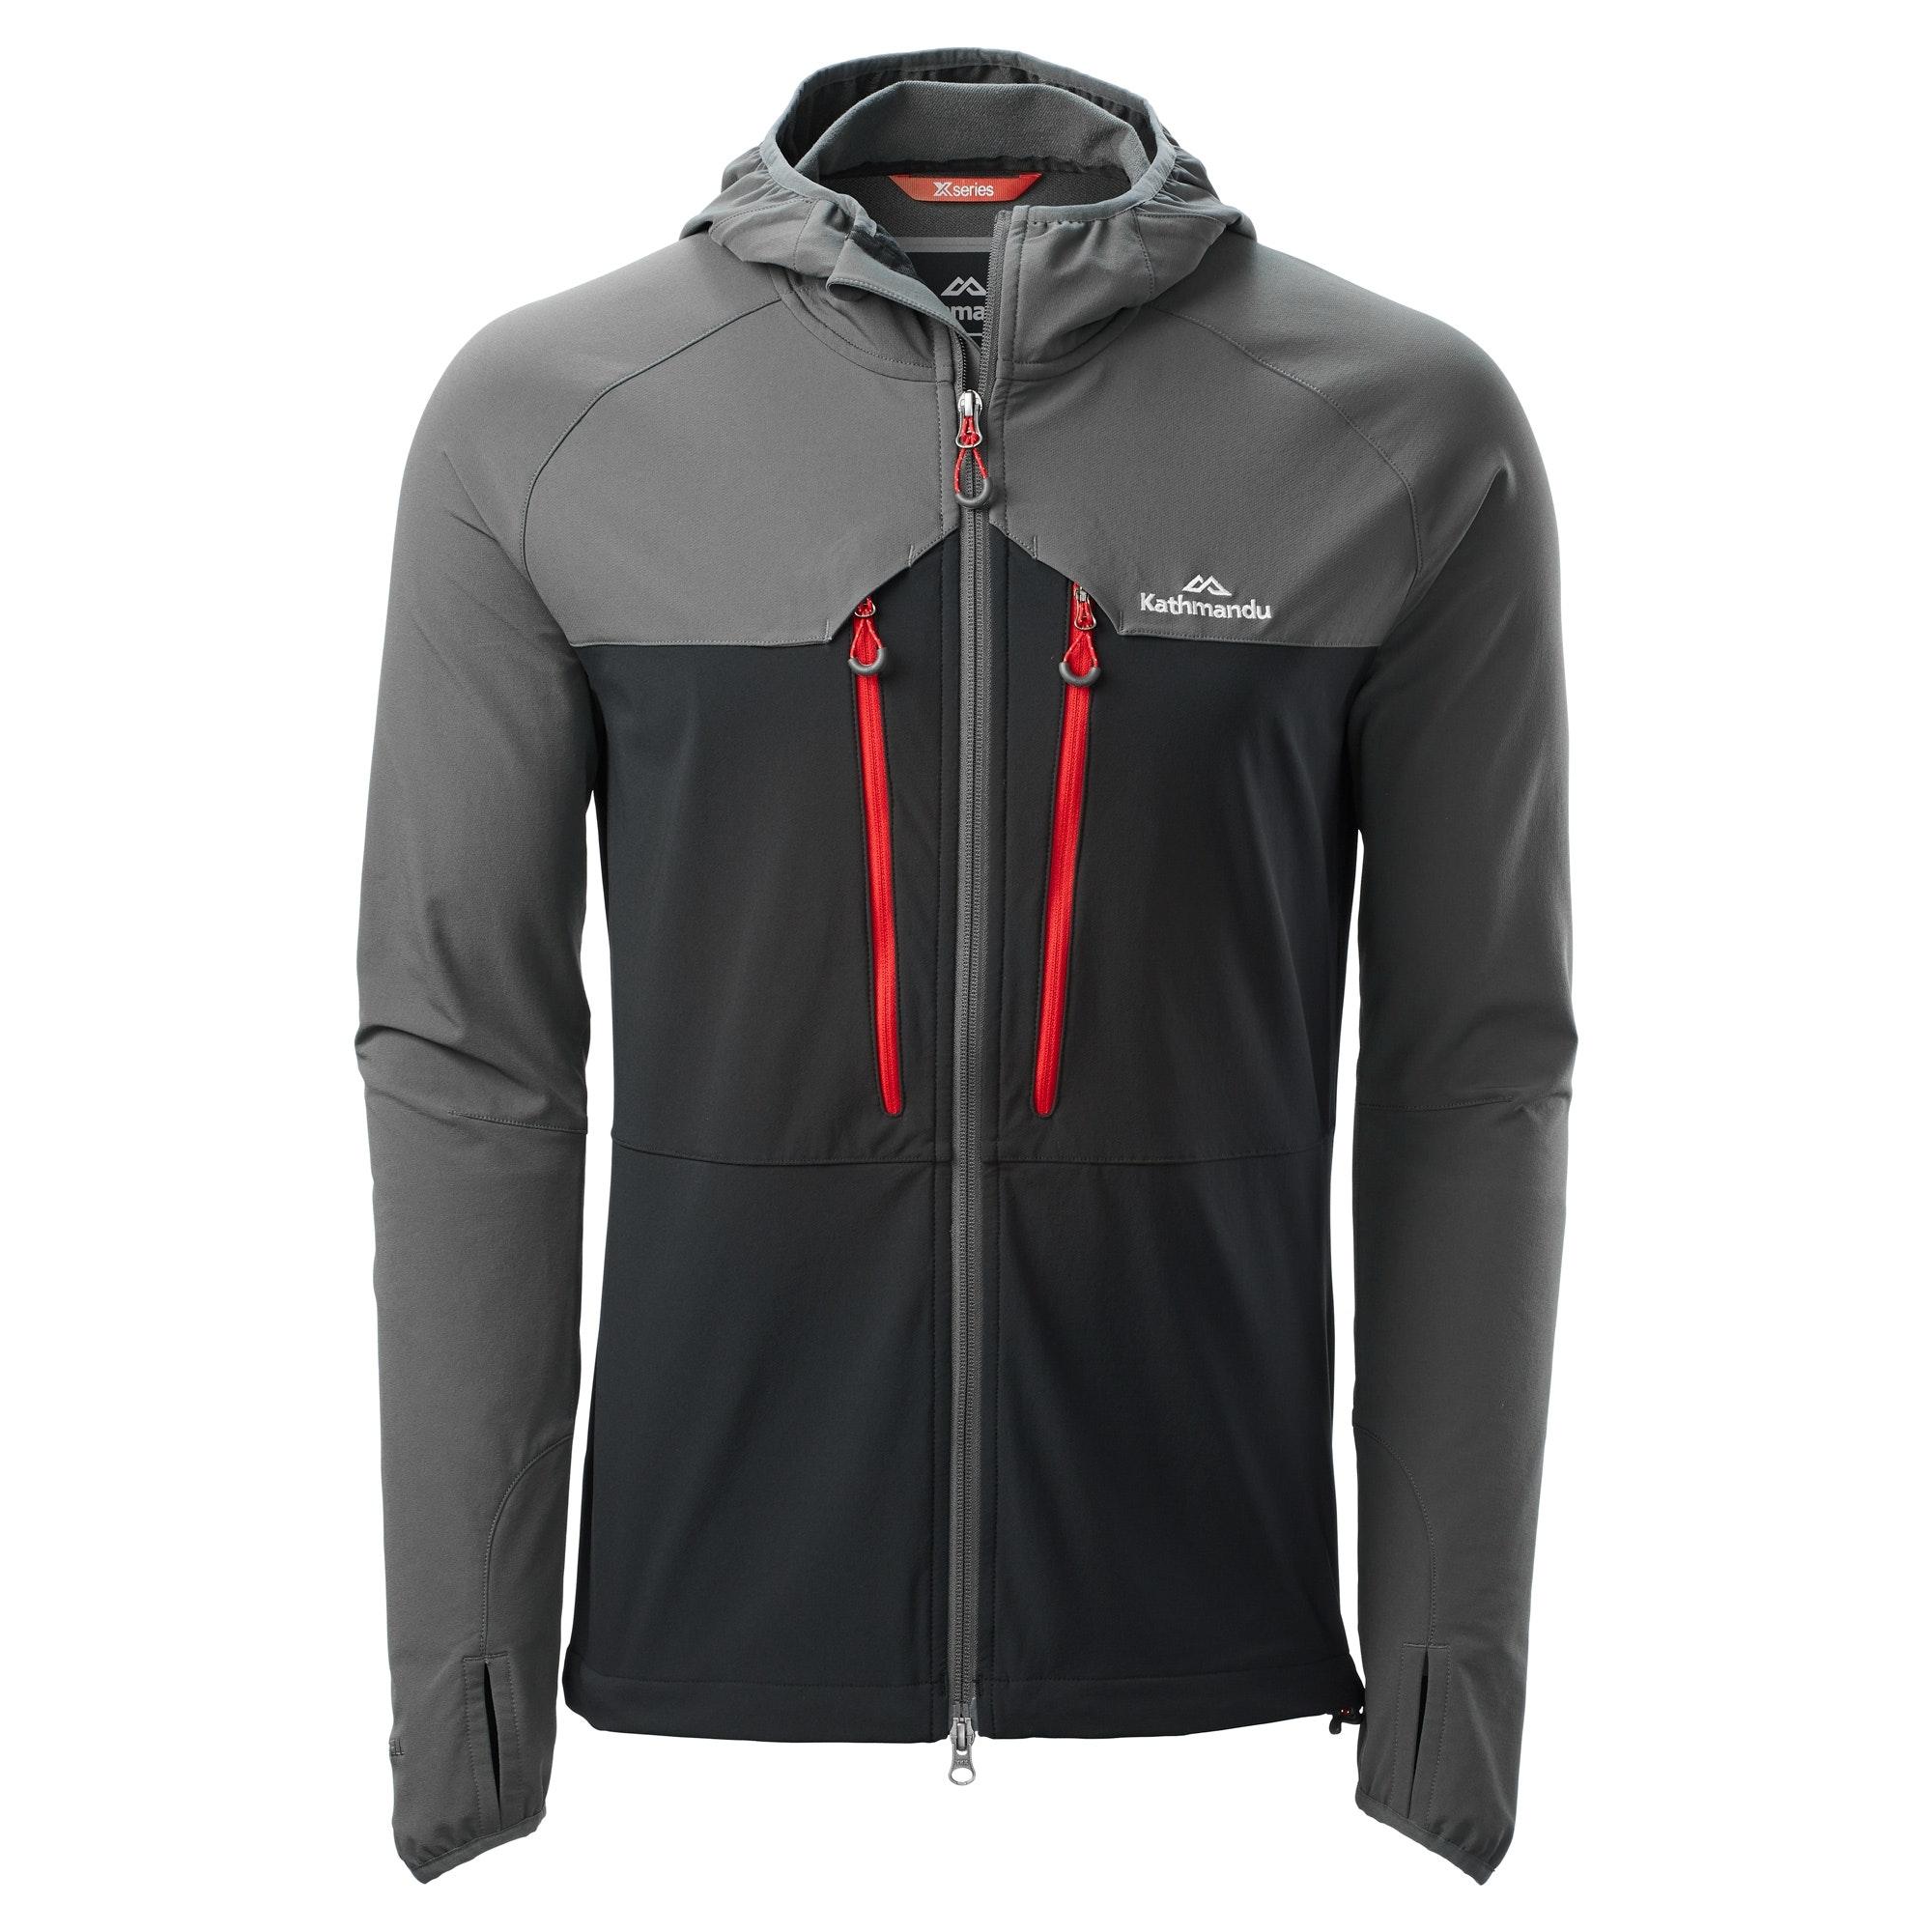 Details about NEW Kathmandu XT Terrno Men's Hooded Wind Water Resistant Softshell Jacket v2